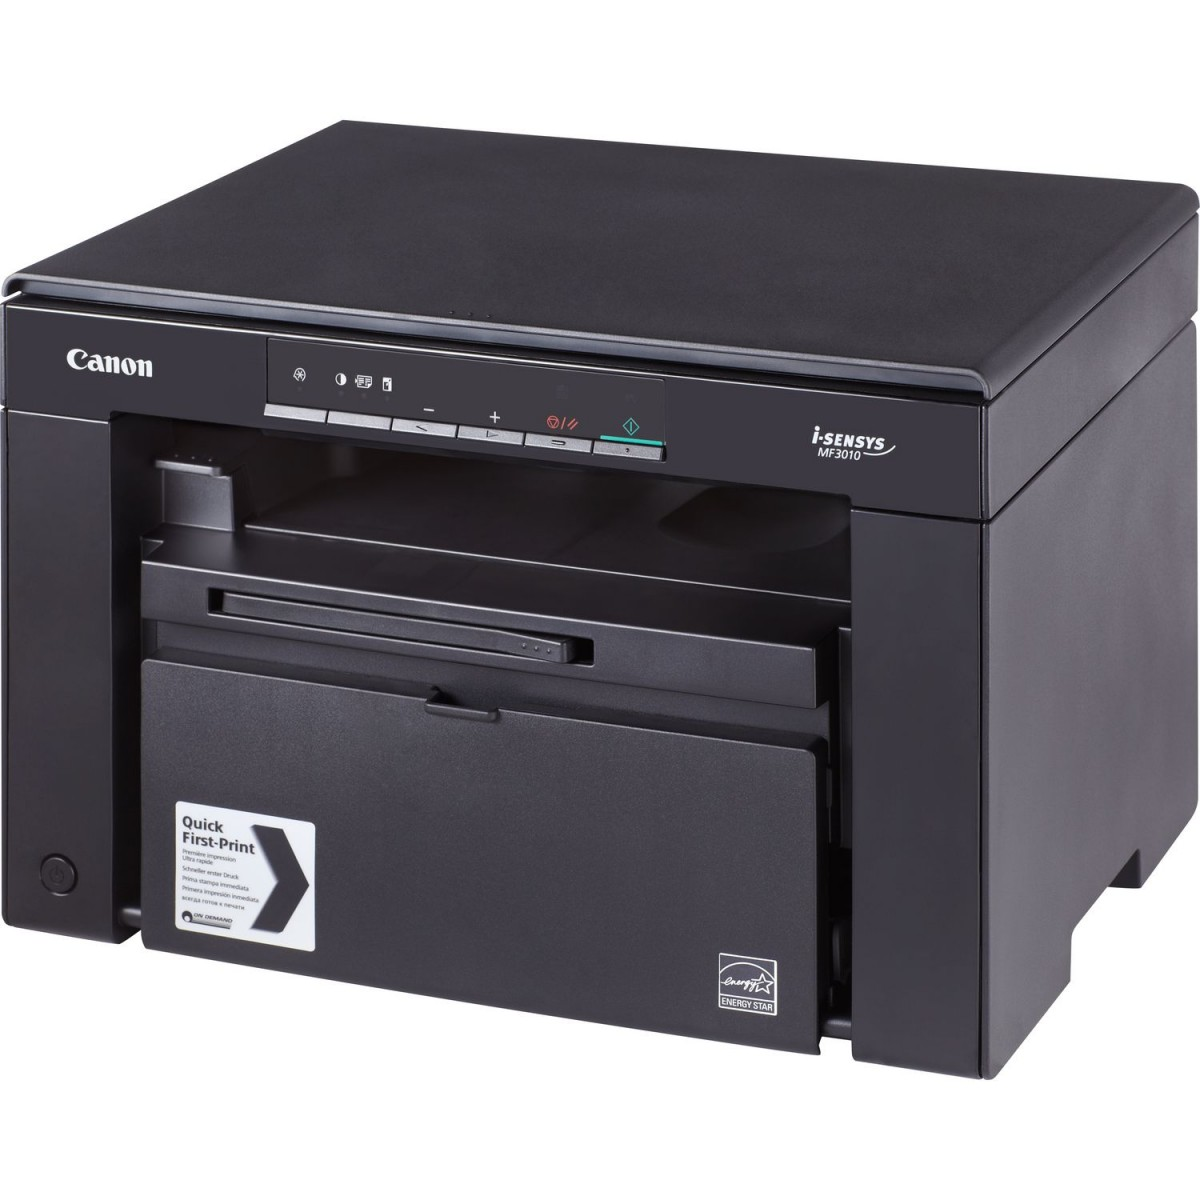 Canon i-SENSYS MF3010 Multifunction Laser Printer